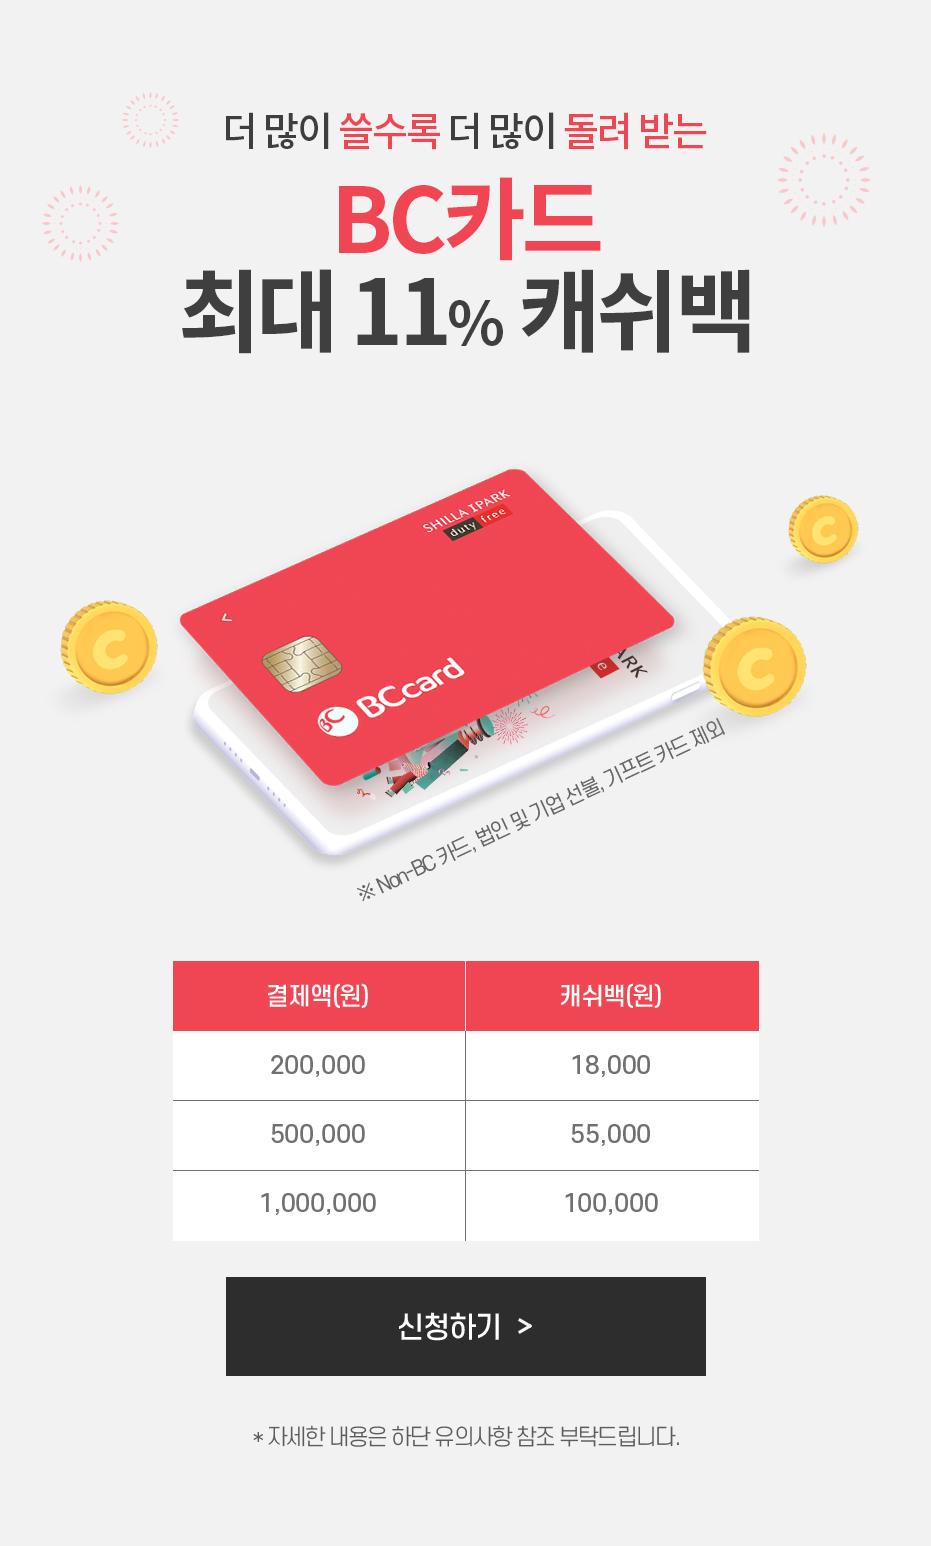 BC카드 캐쉬백 이벤트